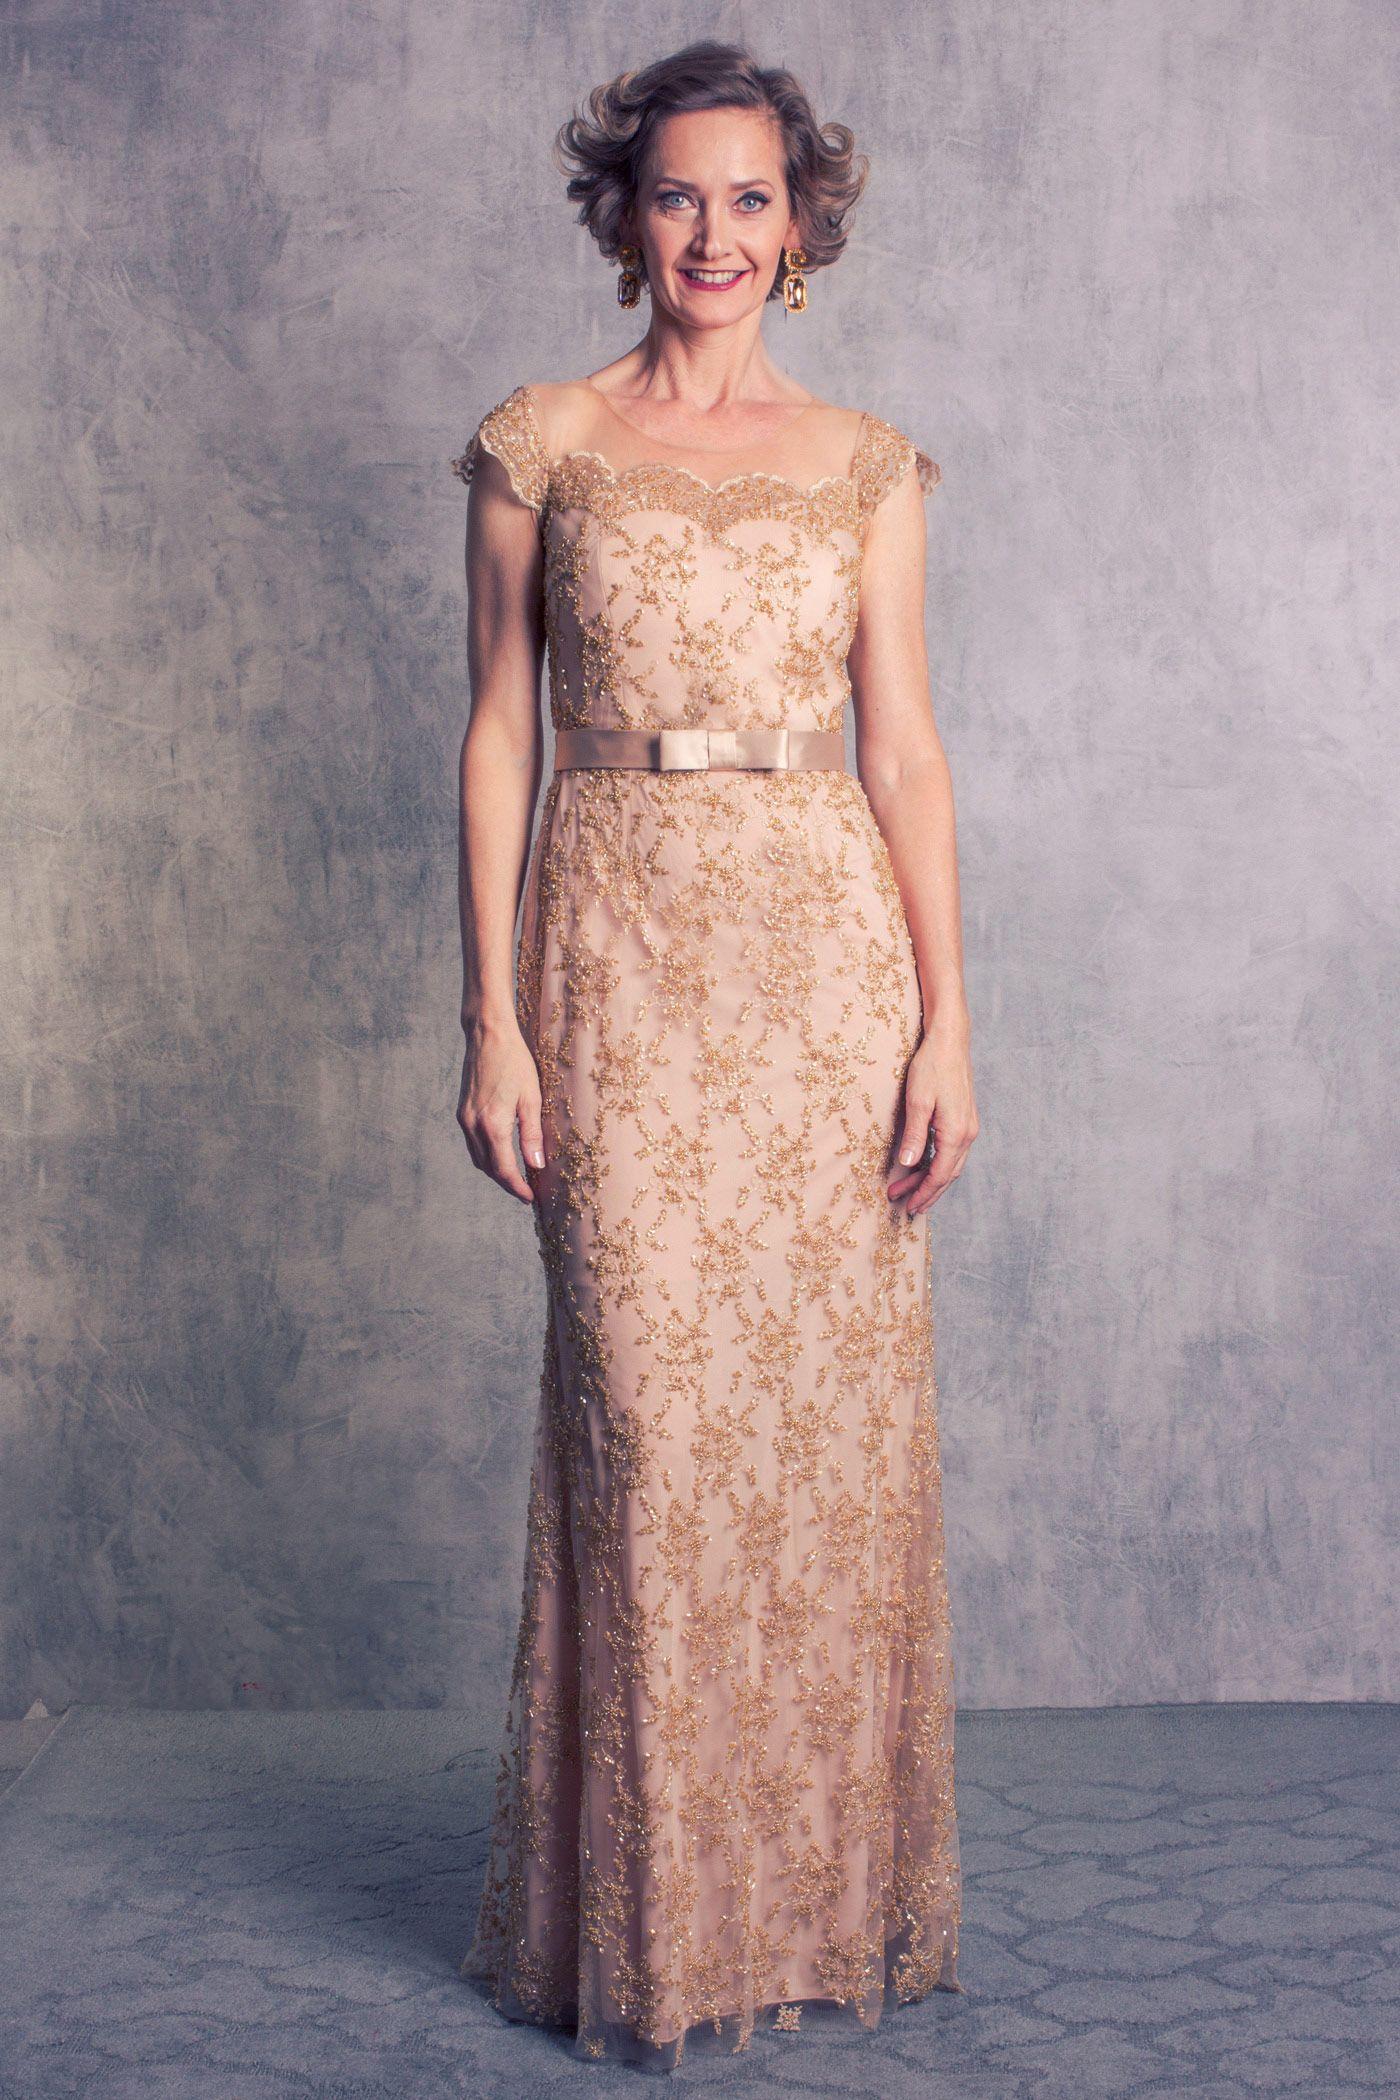 37e9790e864 Amei este vestido longo de festa da coleção Dear Queens da marca Arthur  Caliman Moda festa